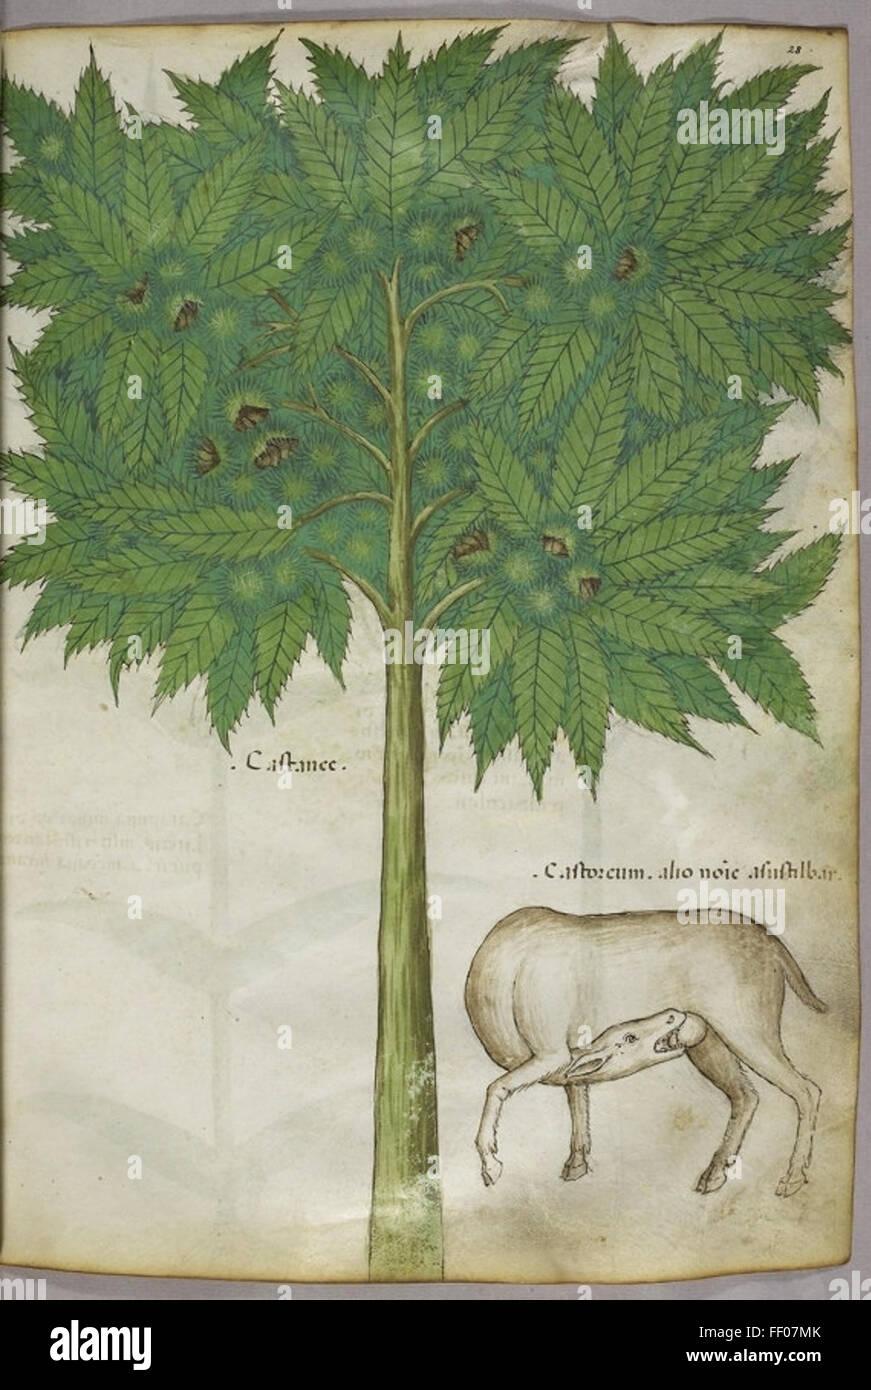 Illustration from Tractatus de Herbis Illustration from Tractatus de Herbis Stock Photo